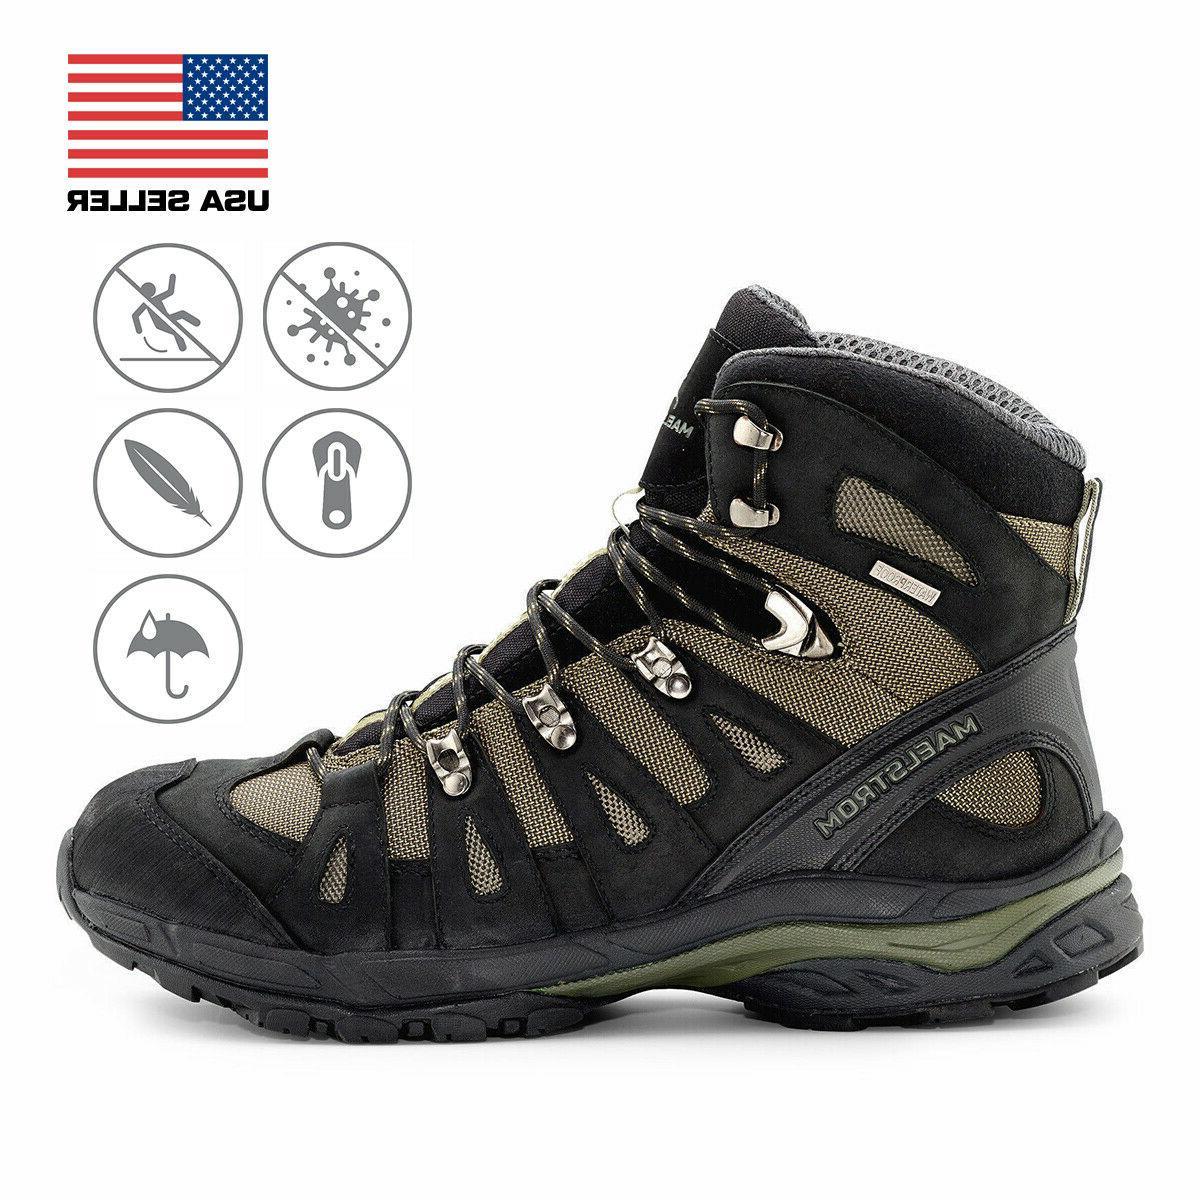 men s waterproof hiking boots in various